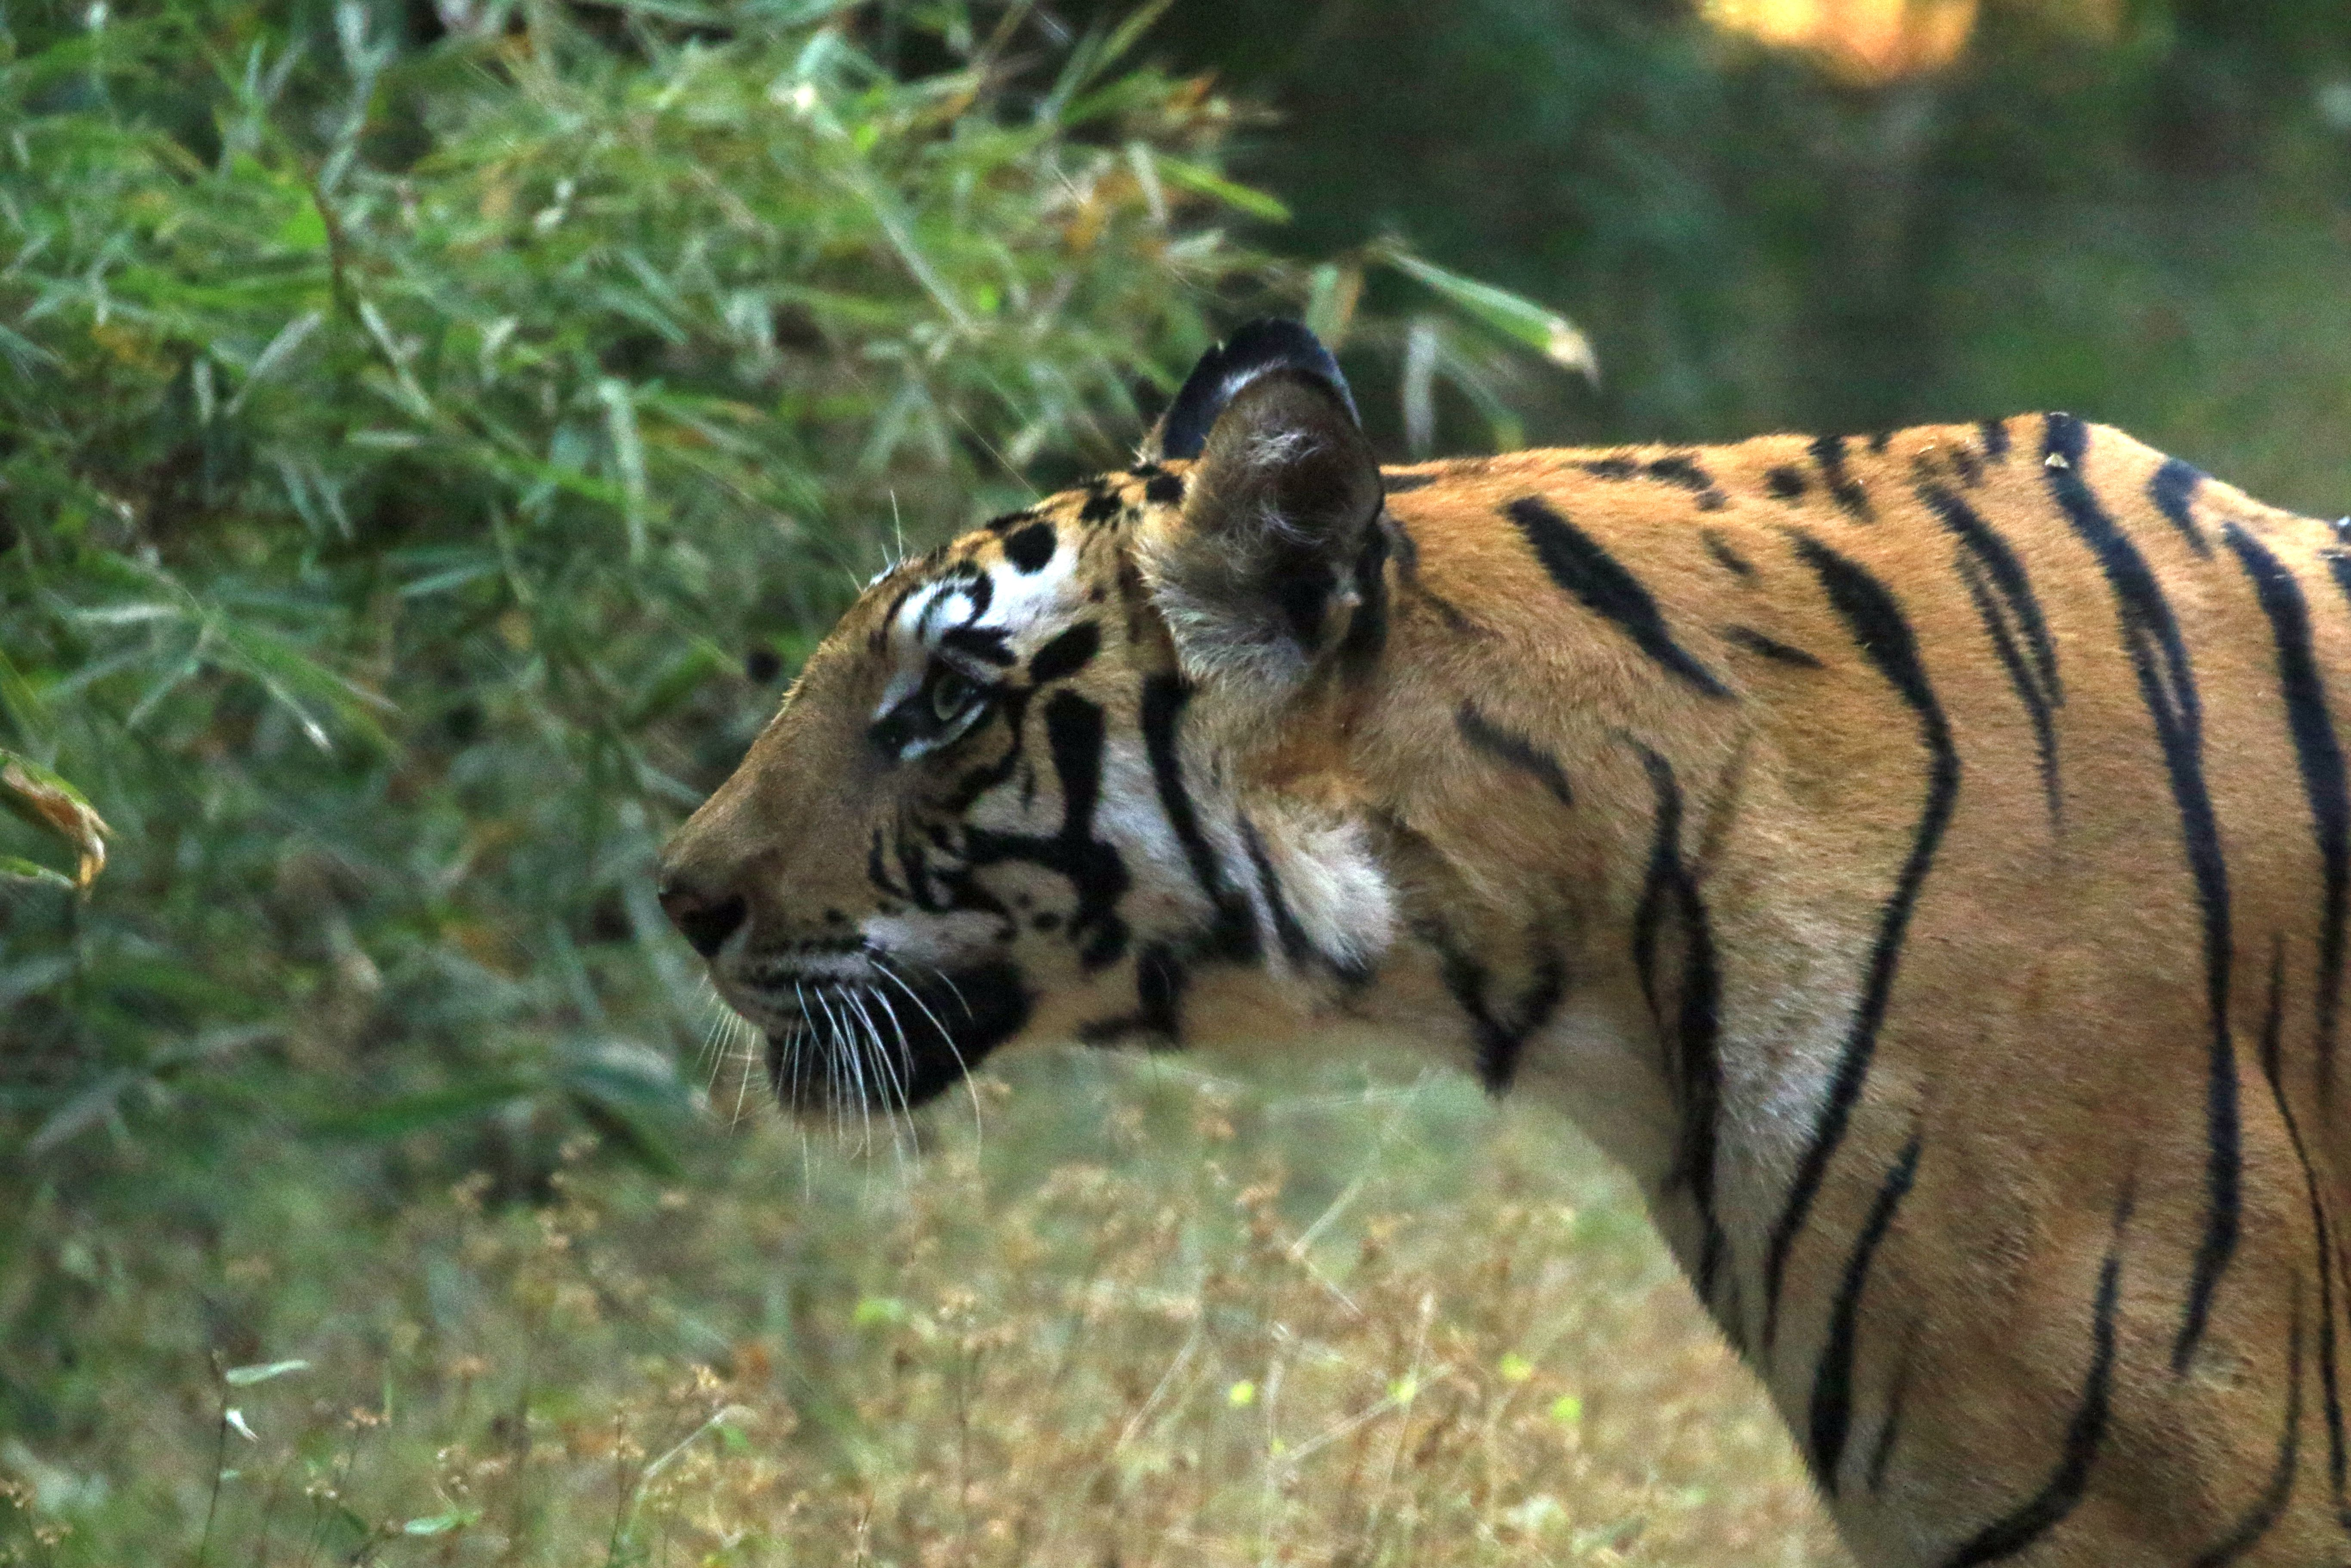 Tiger_Bandhavgarh_43.jpg